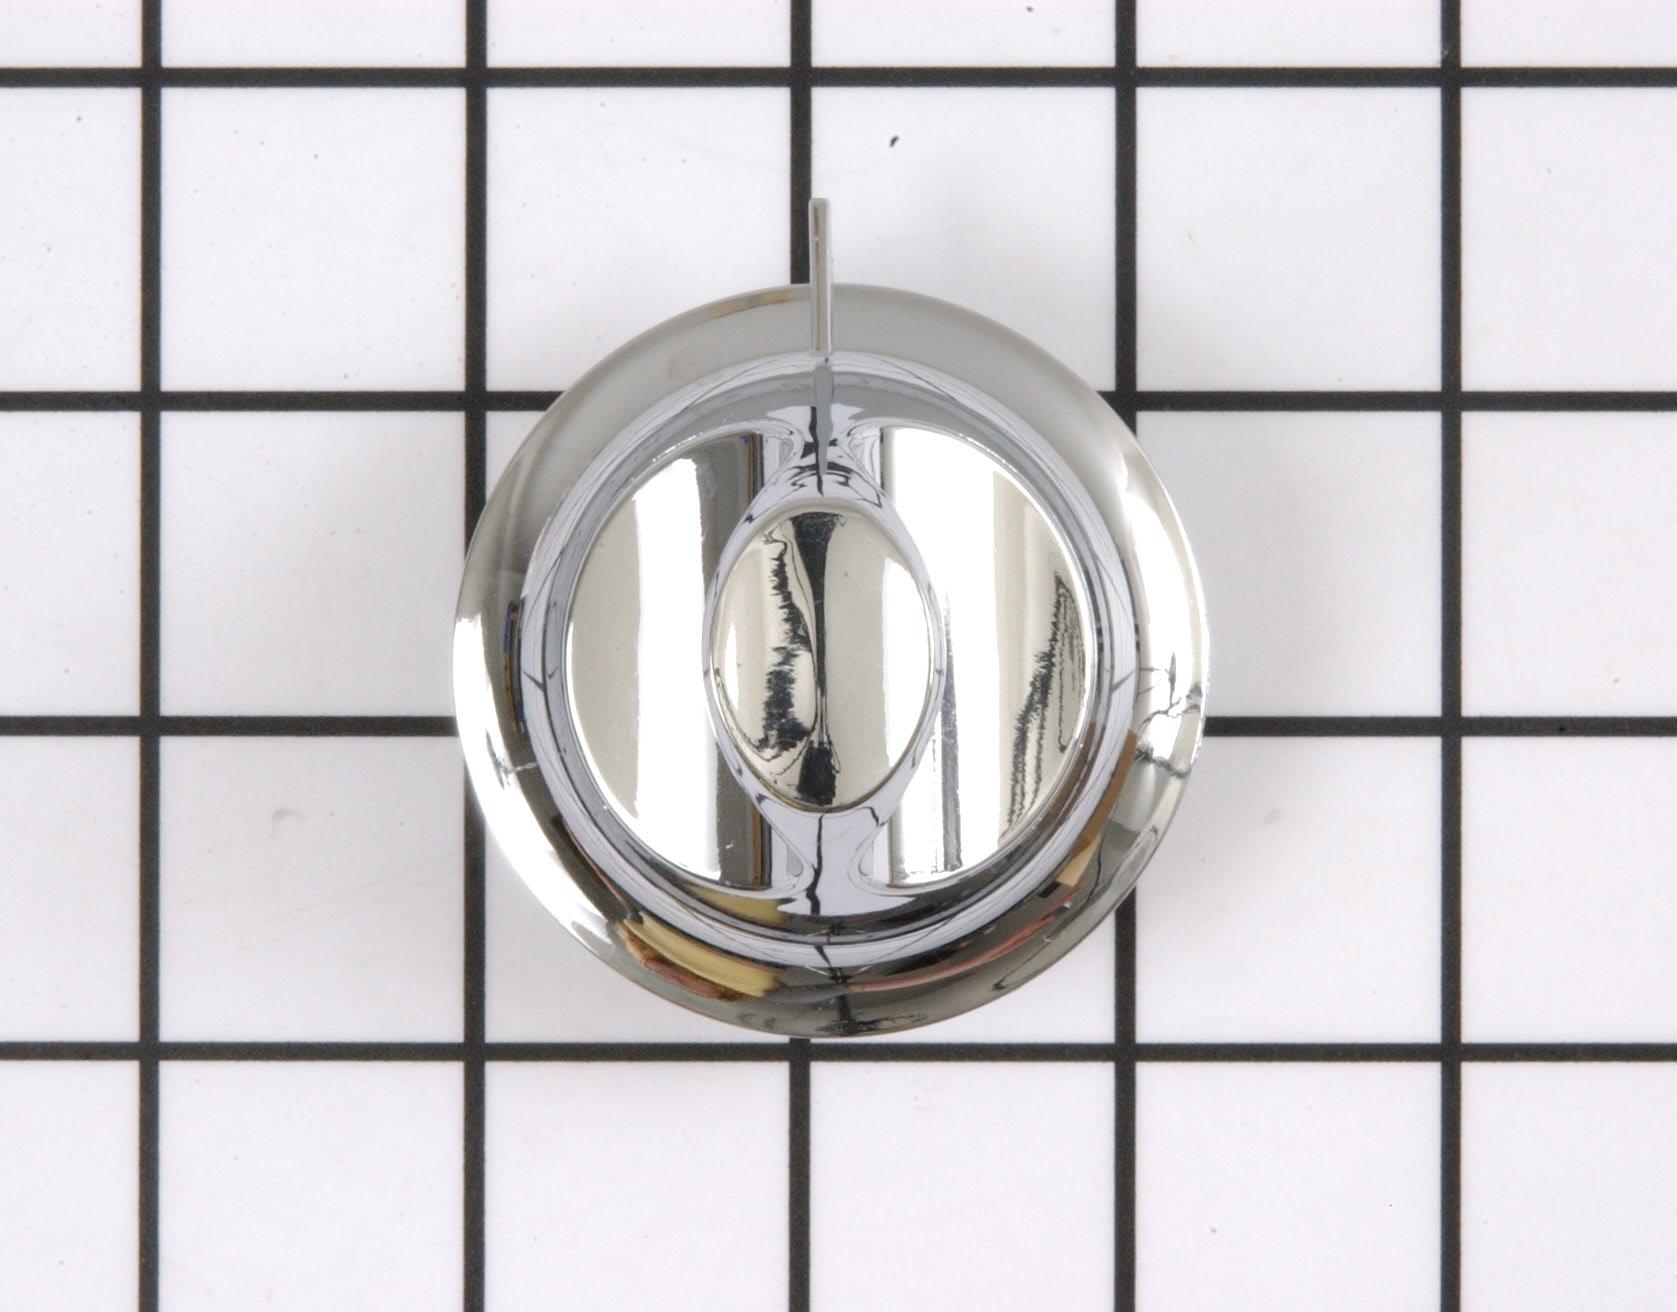 WP688865 Kenmore Dryer Part -Timer Knob